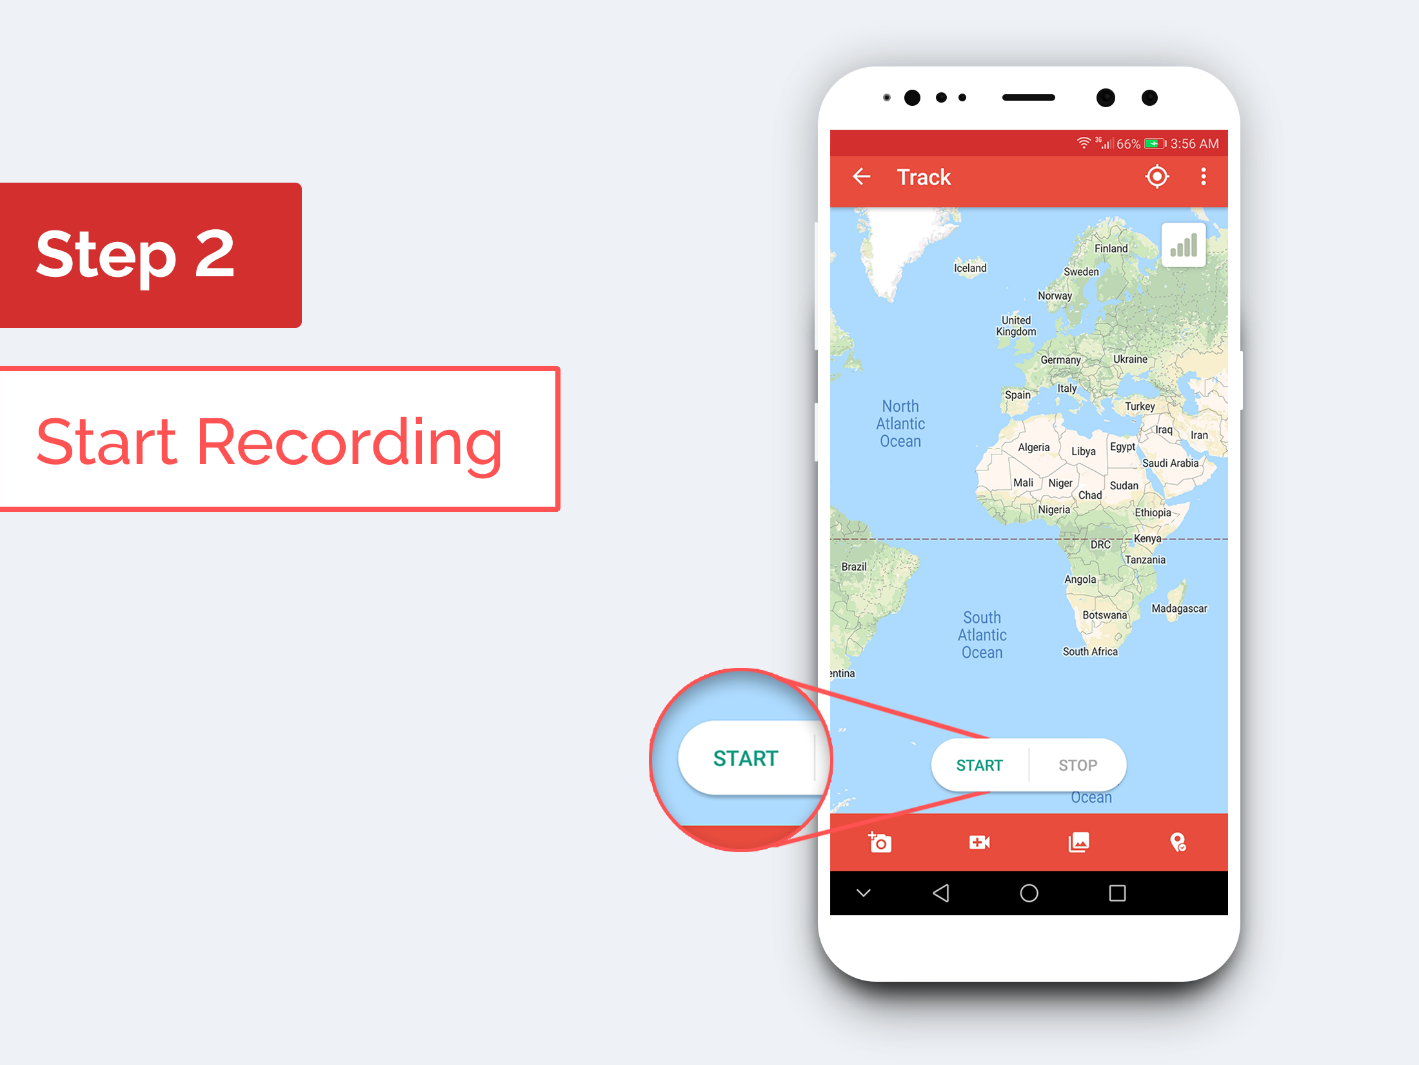 Traverous - Step 2: Start Recording